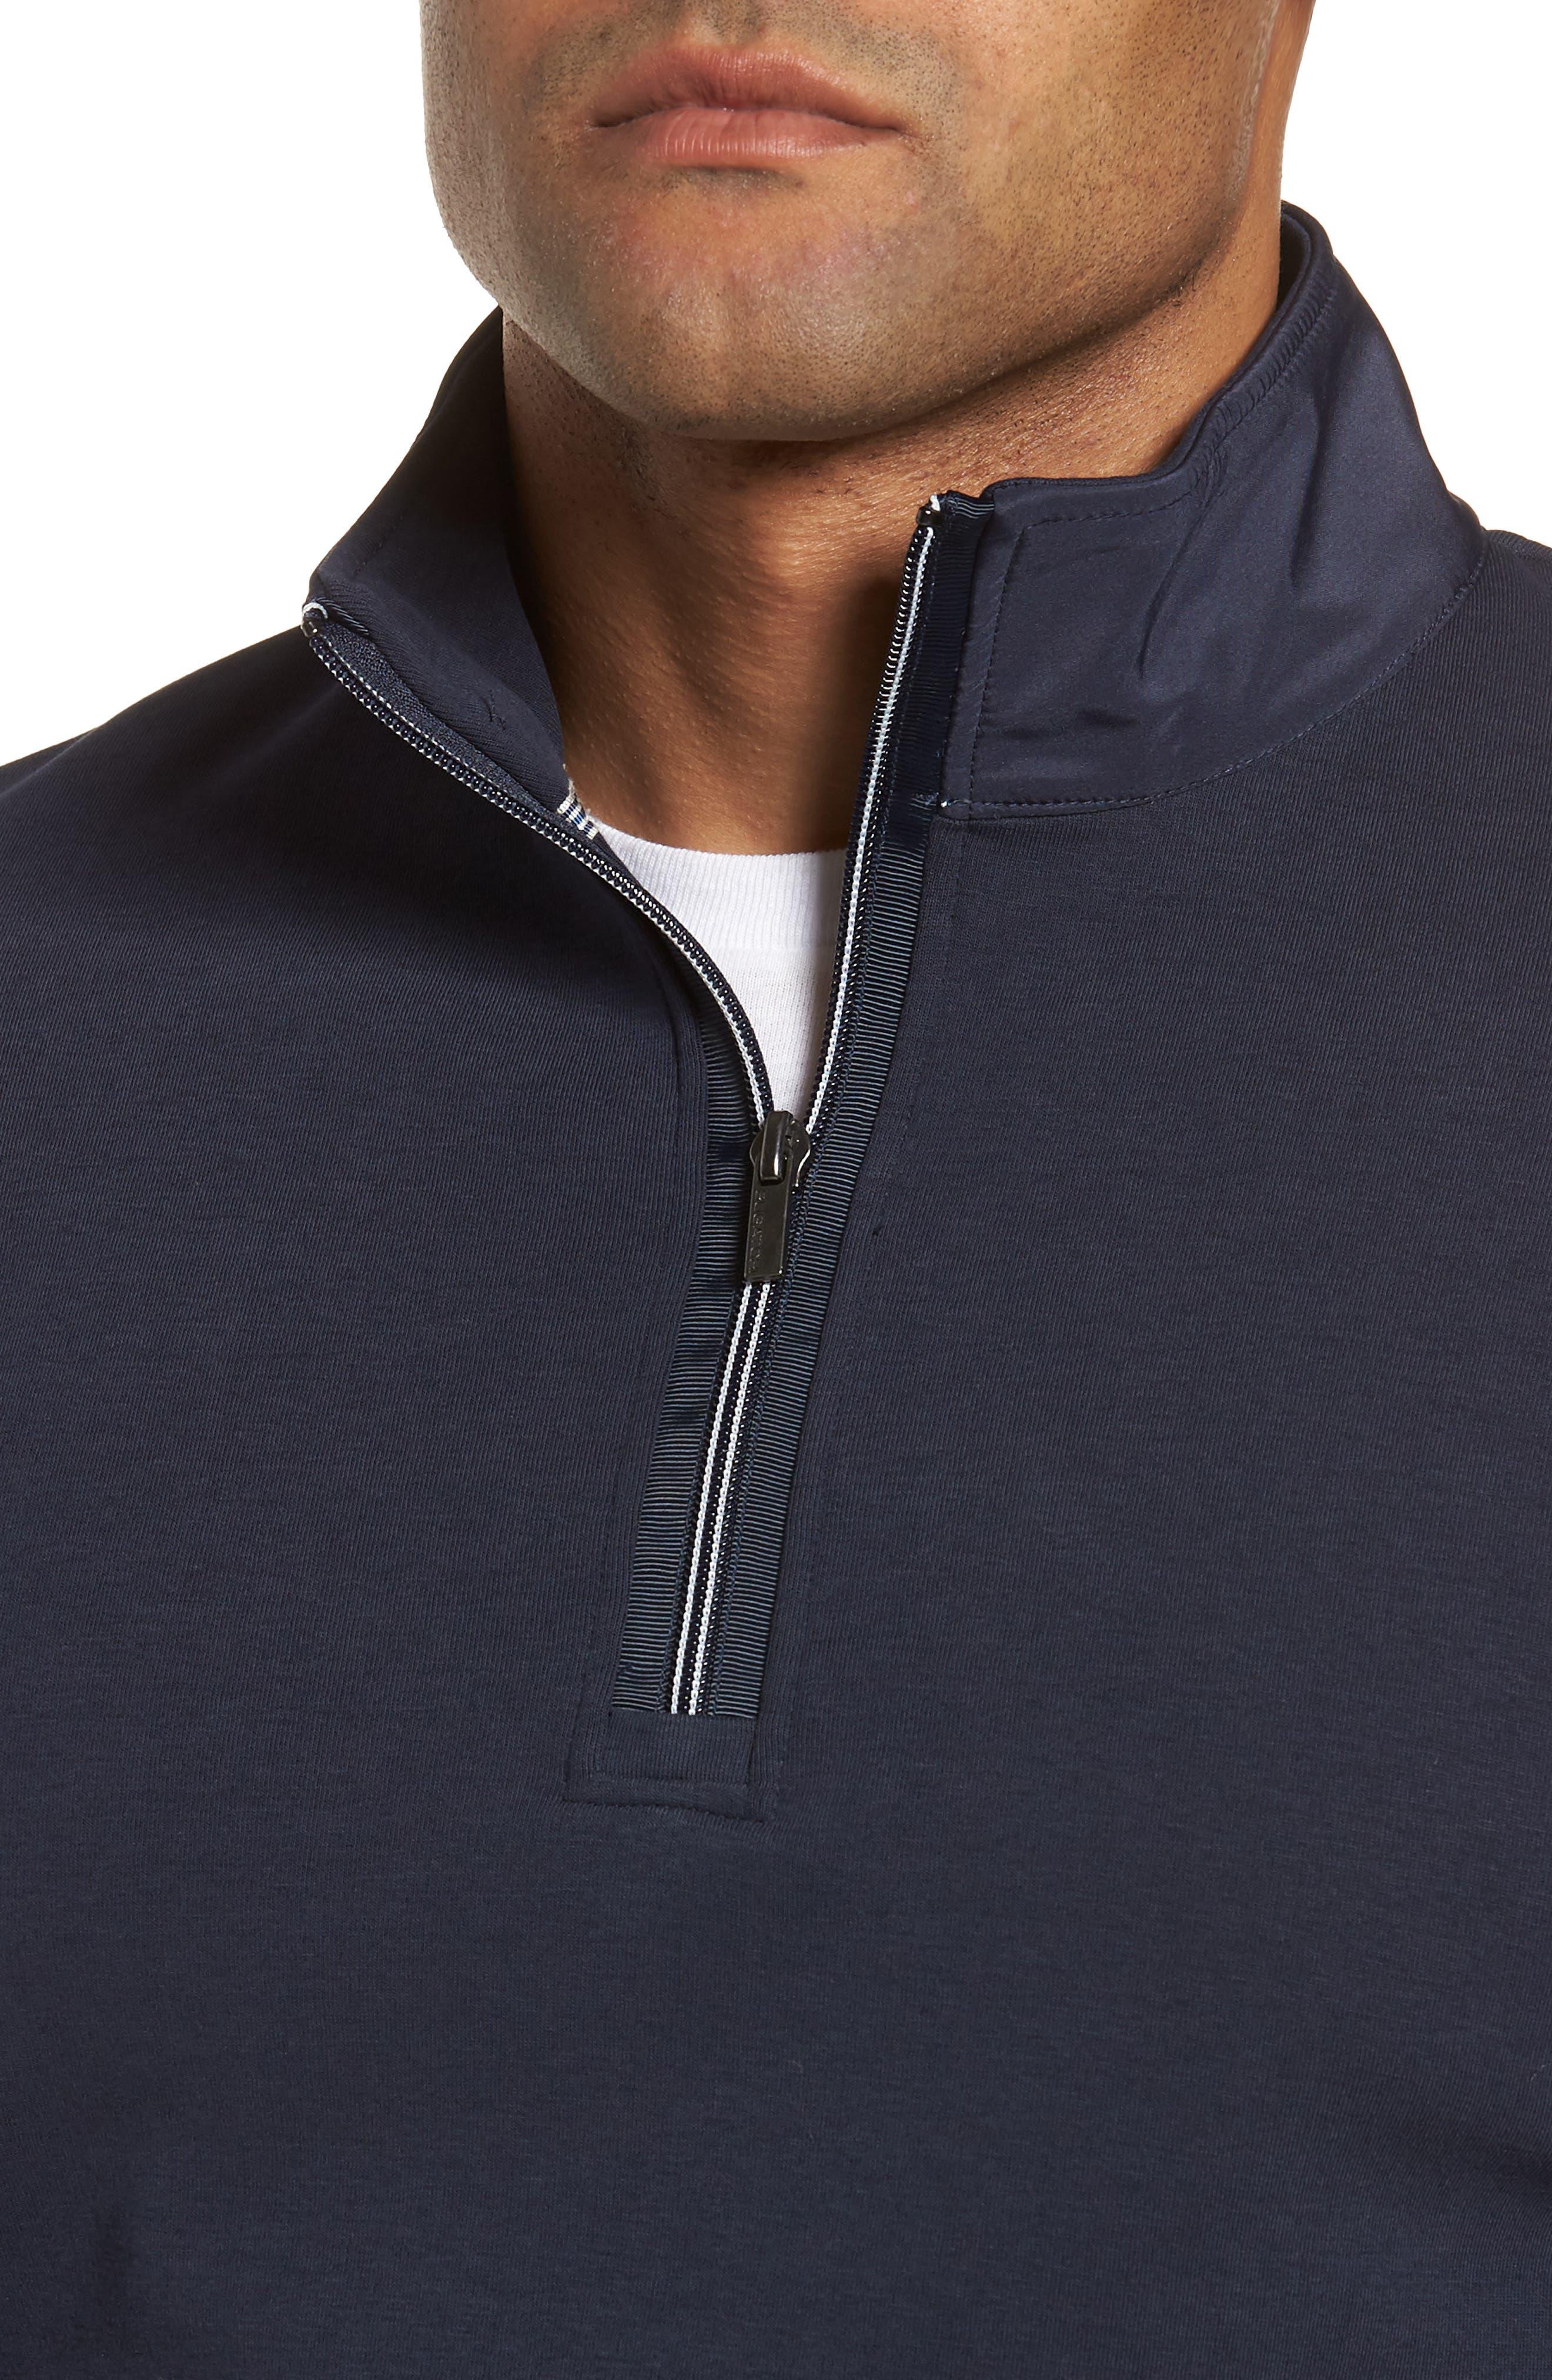 Regular Fit Quarter Zip Pullover,                             Alternate thumbnail 4, color,                             Navy